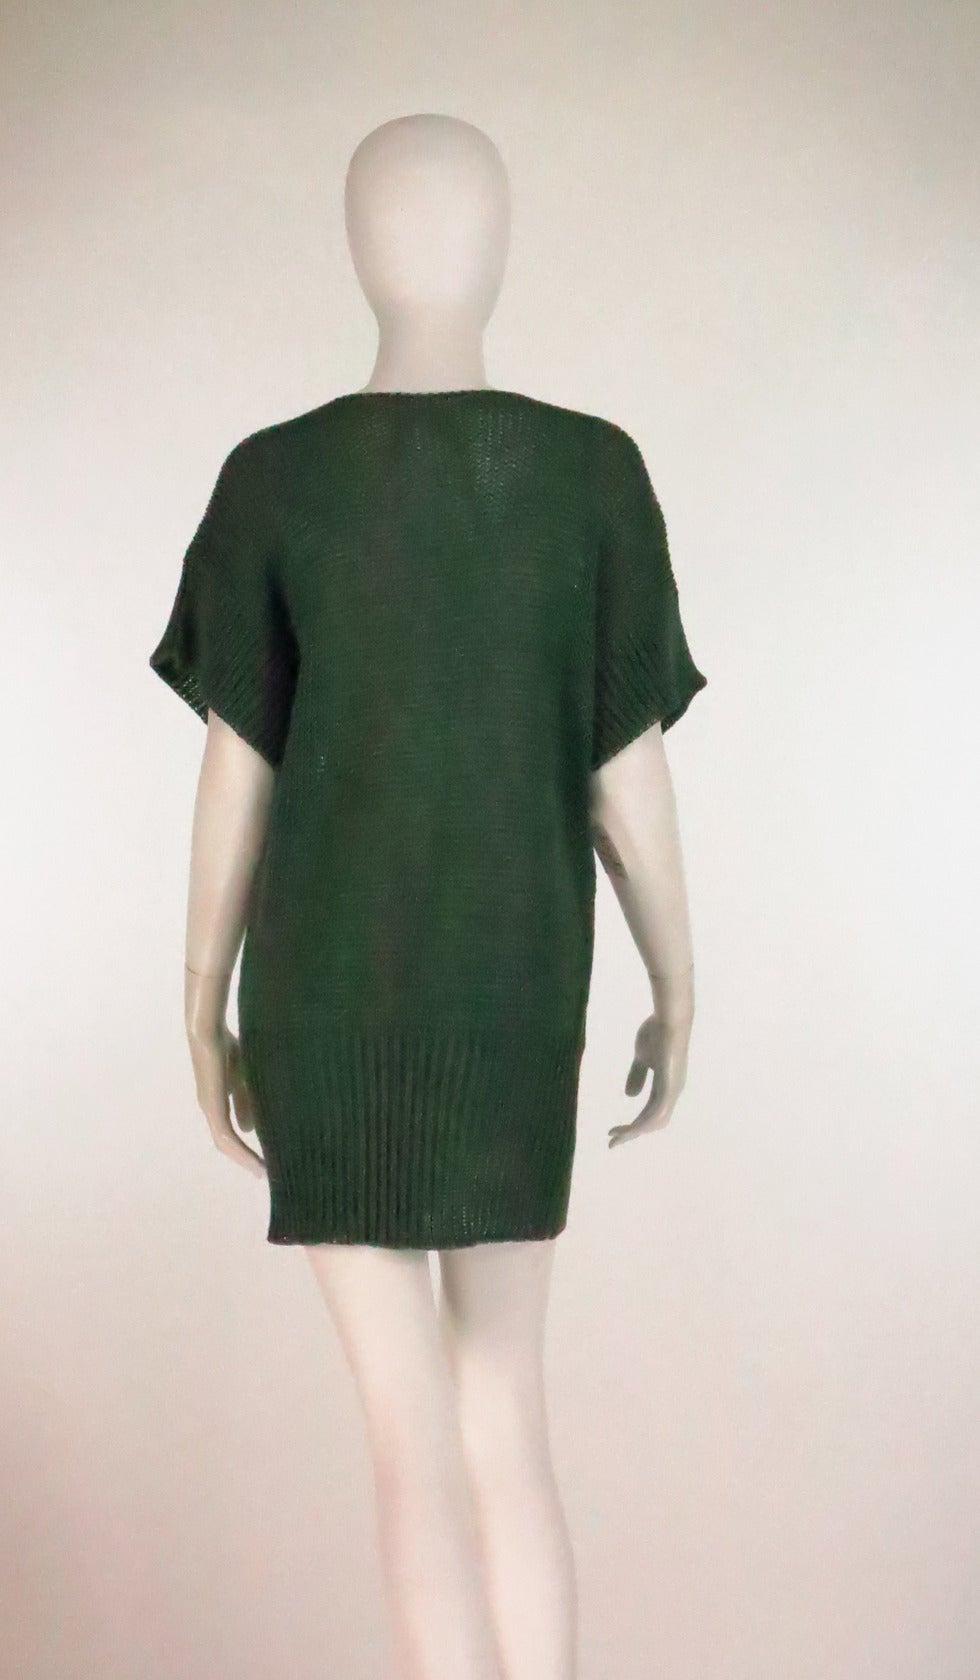 1980s Jil Sander pine green sweater knit tunic 4